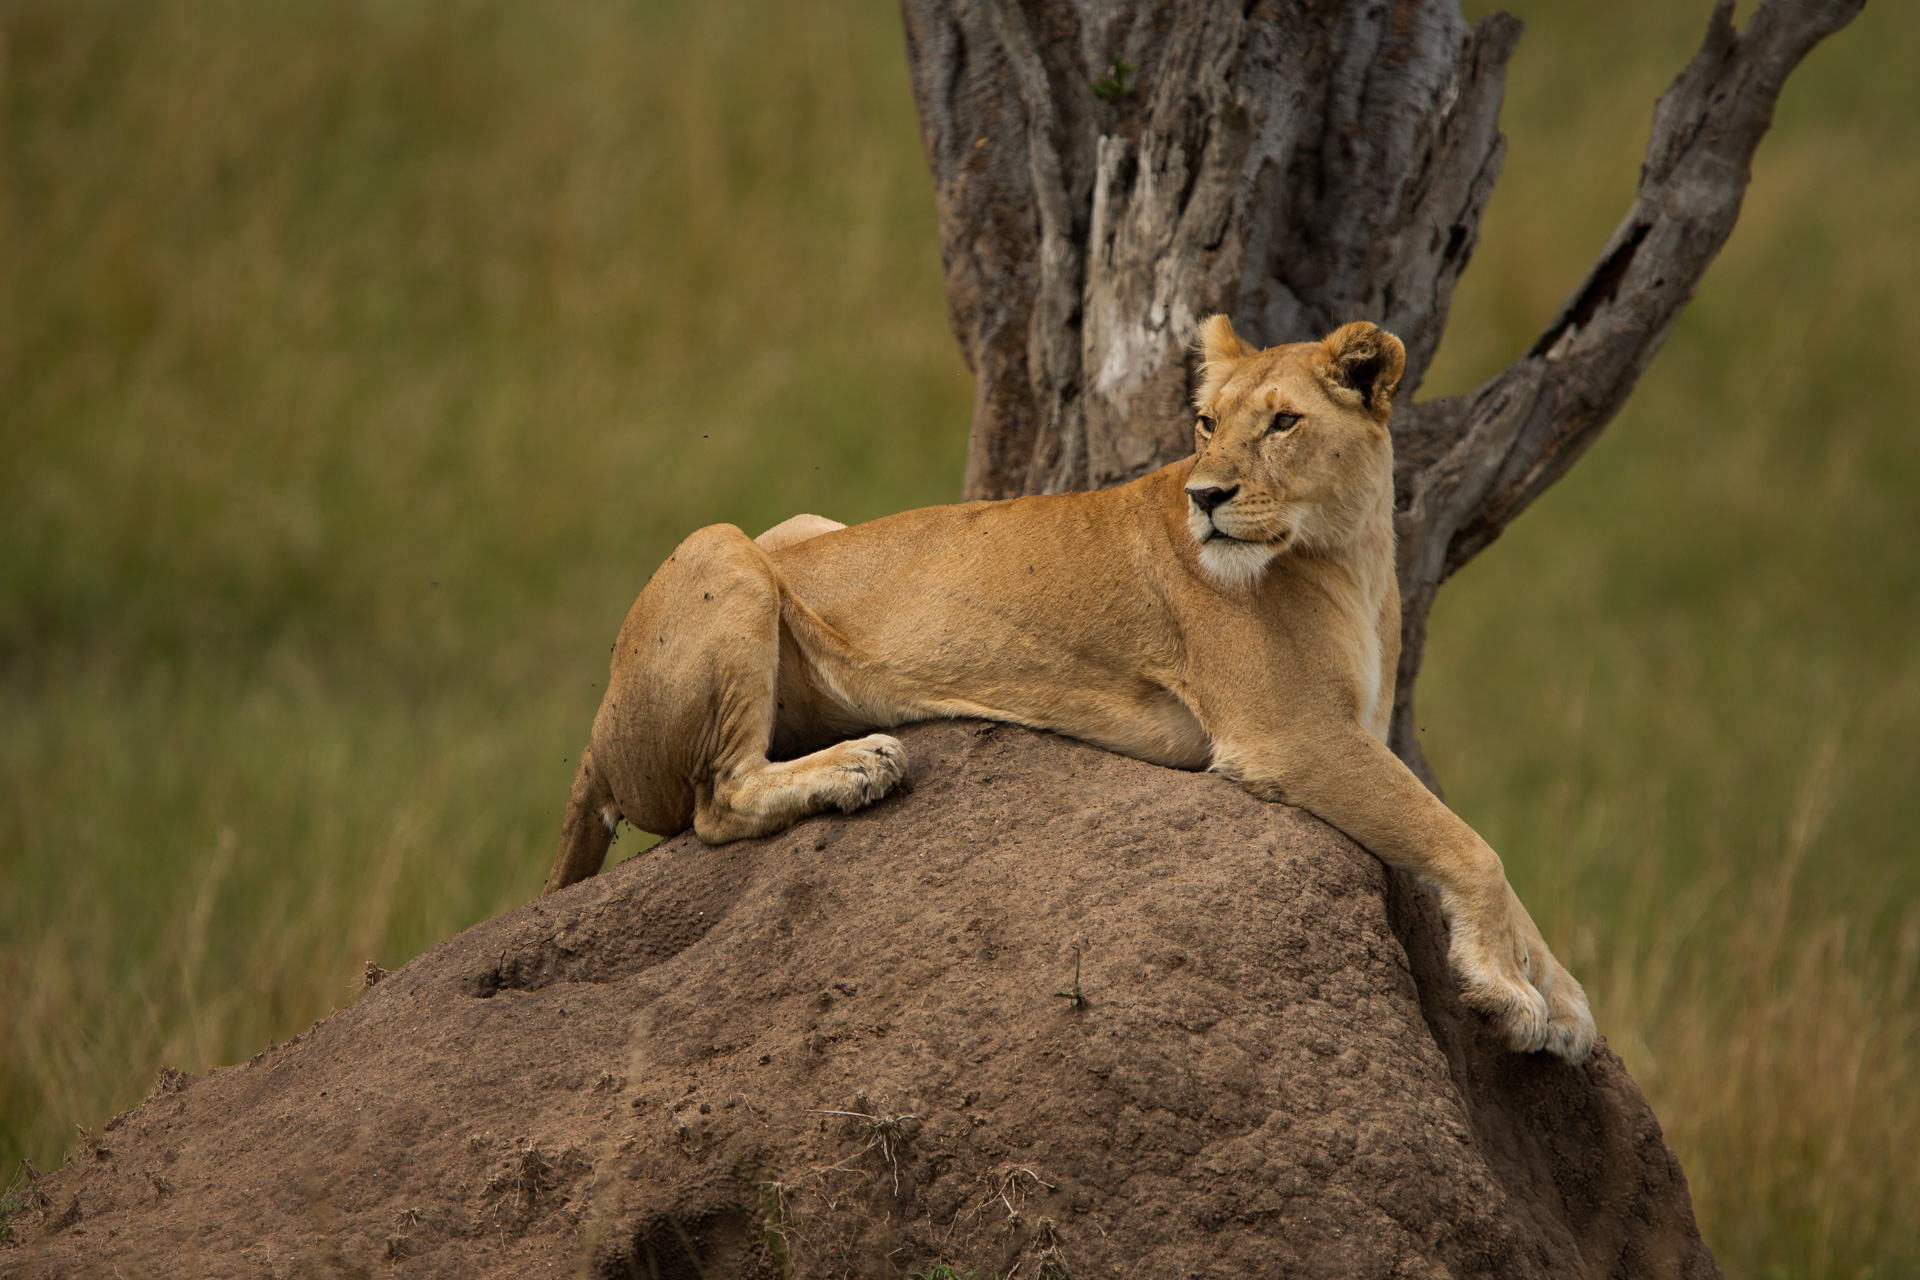 Lioness on mound